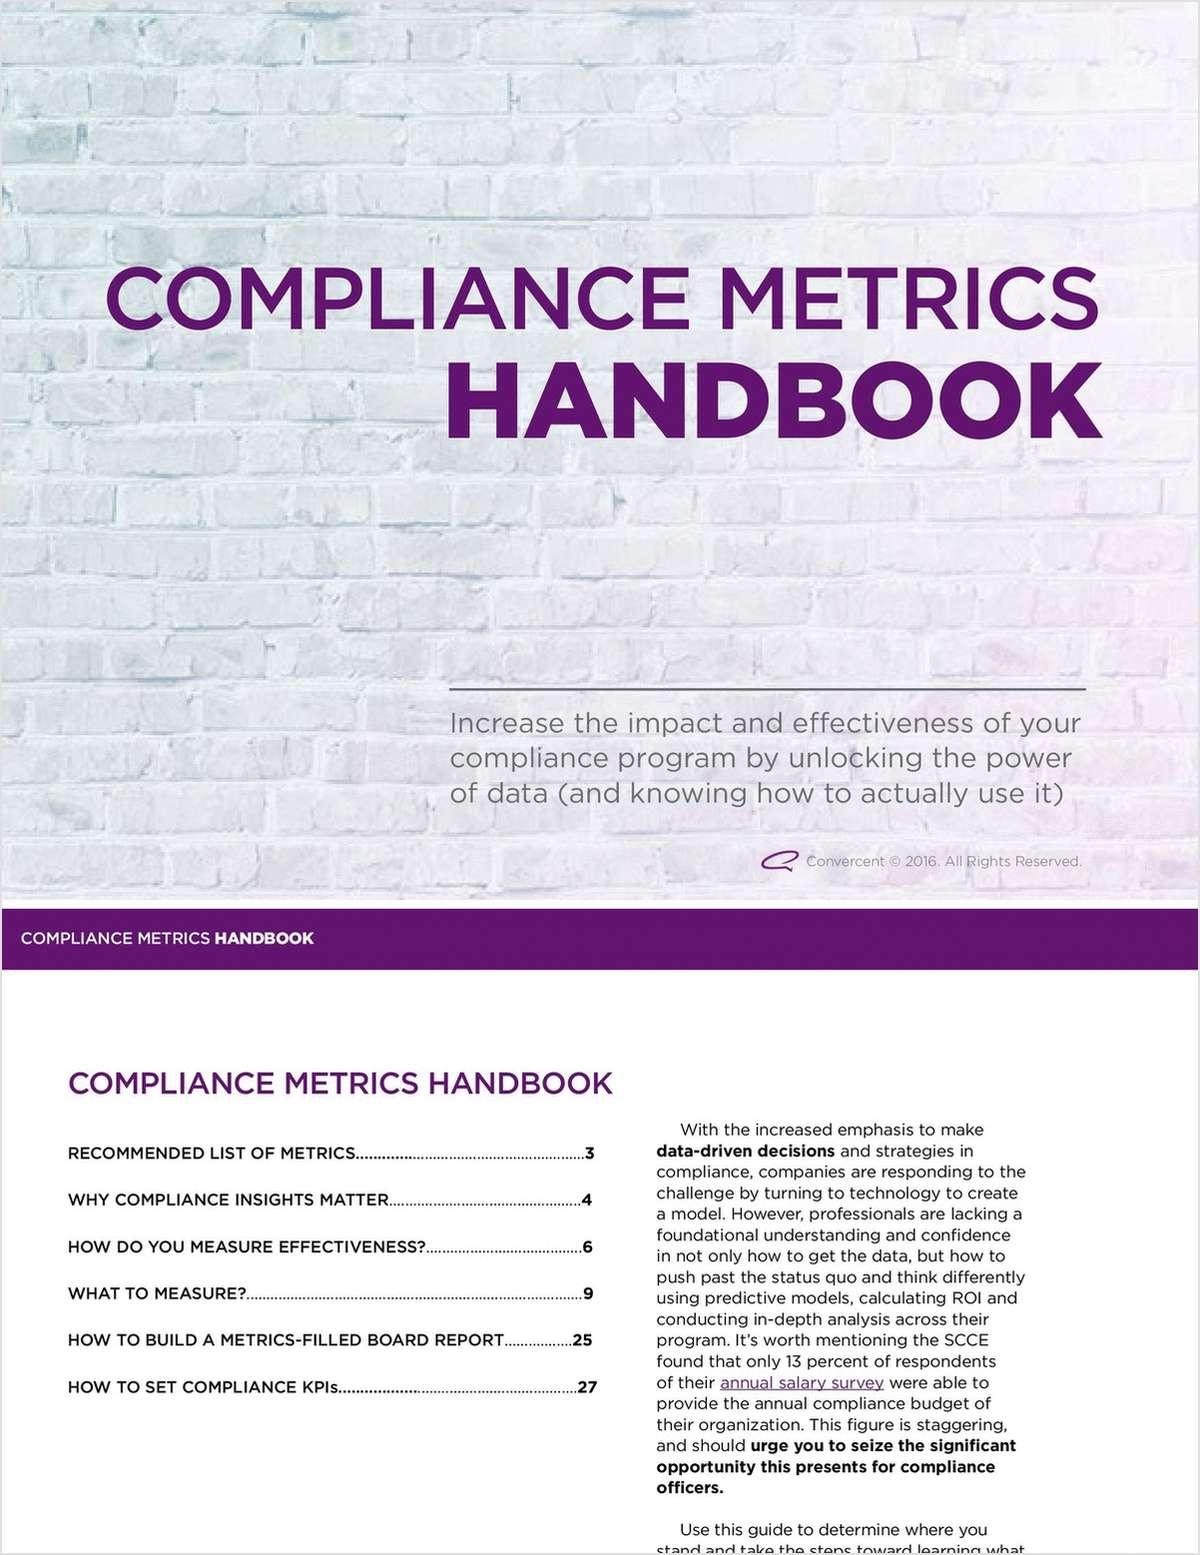 The Compliance Metrics Handbook